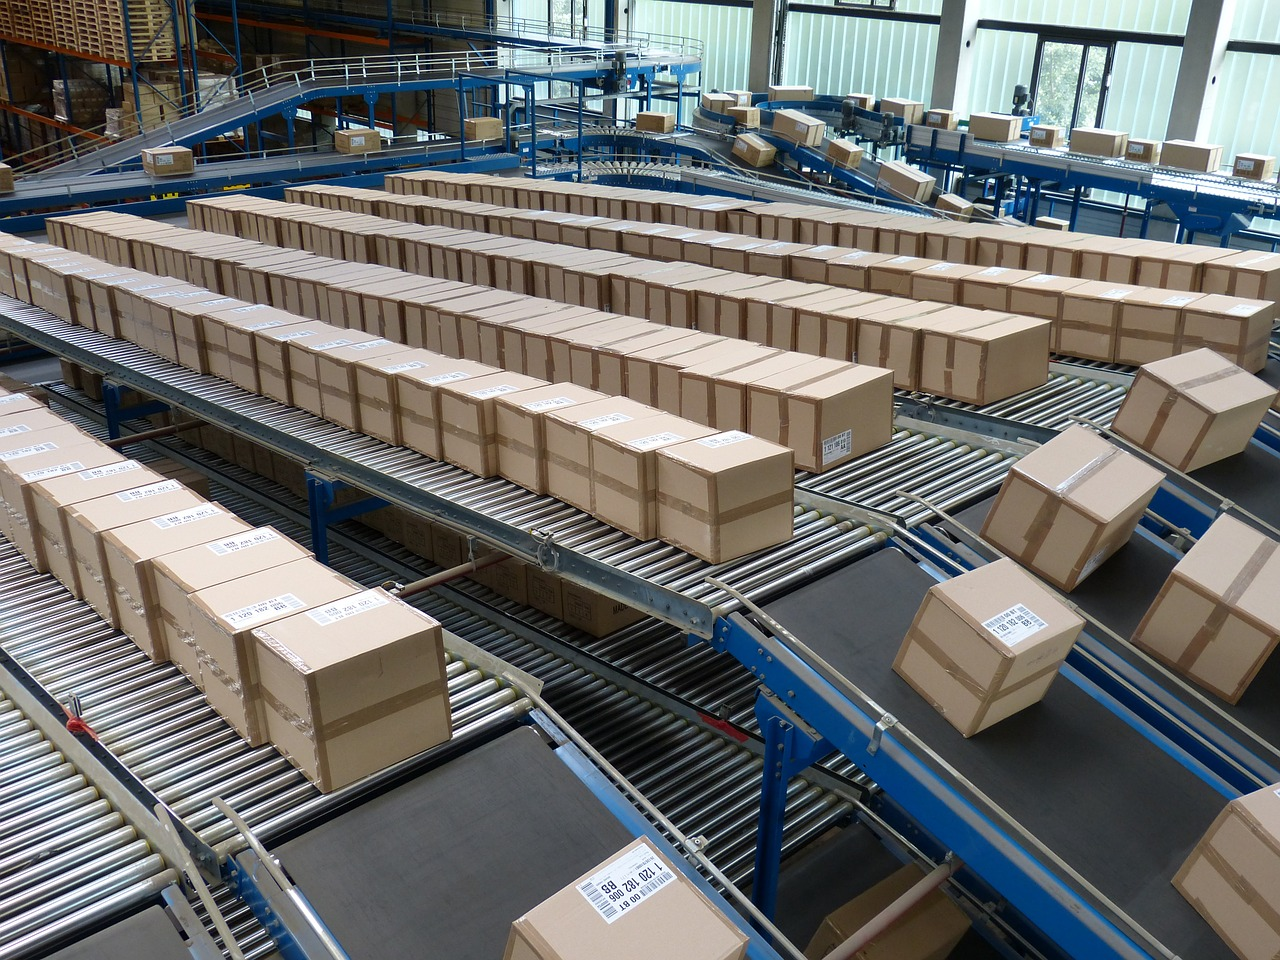 Paketverarbeitungszentrum